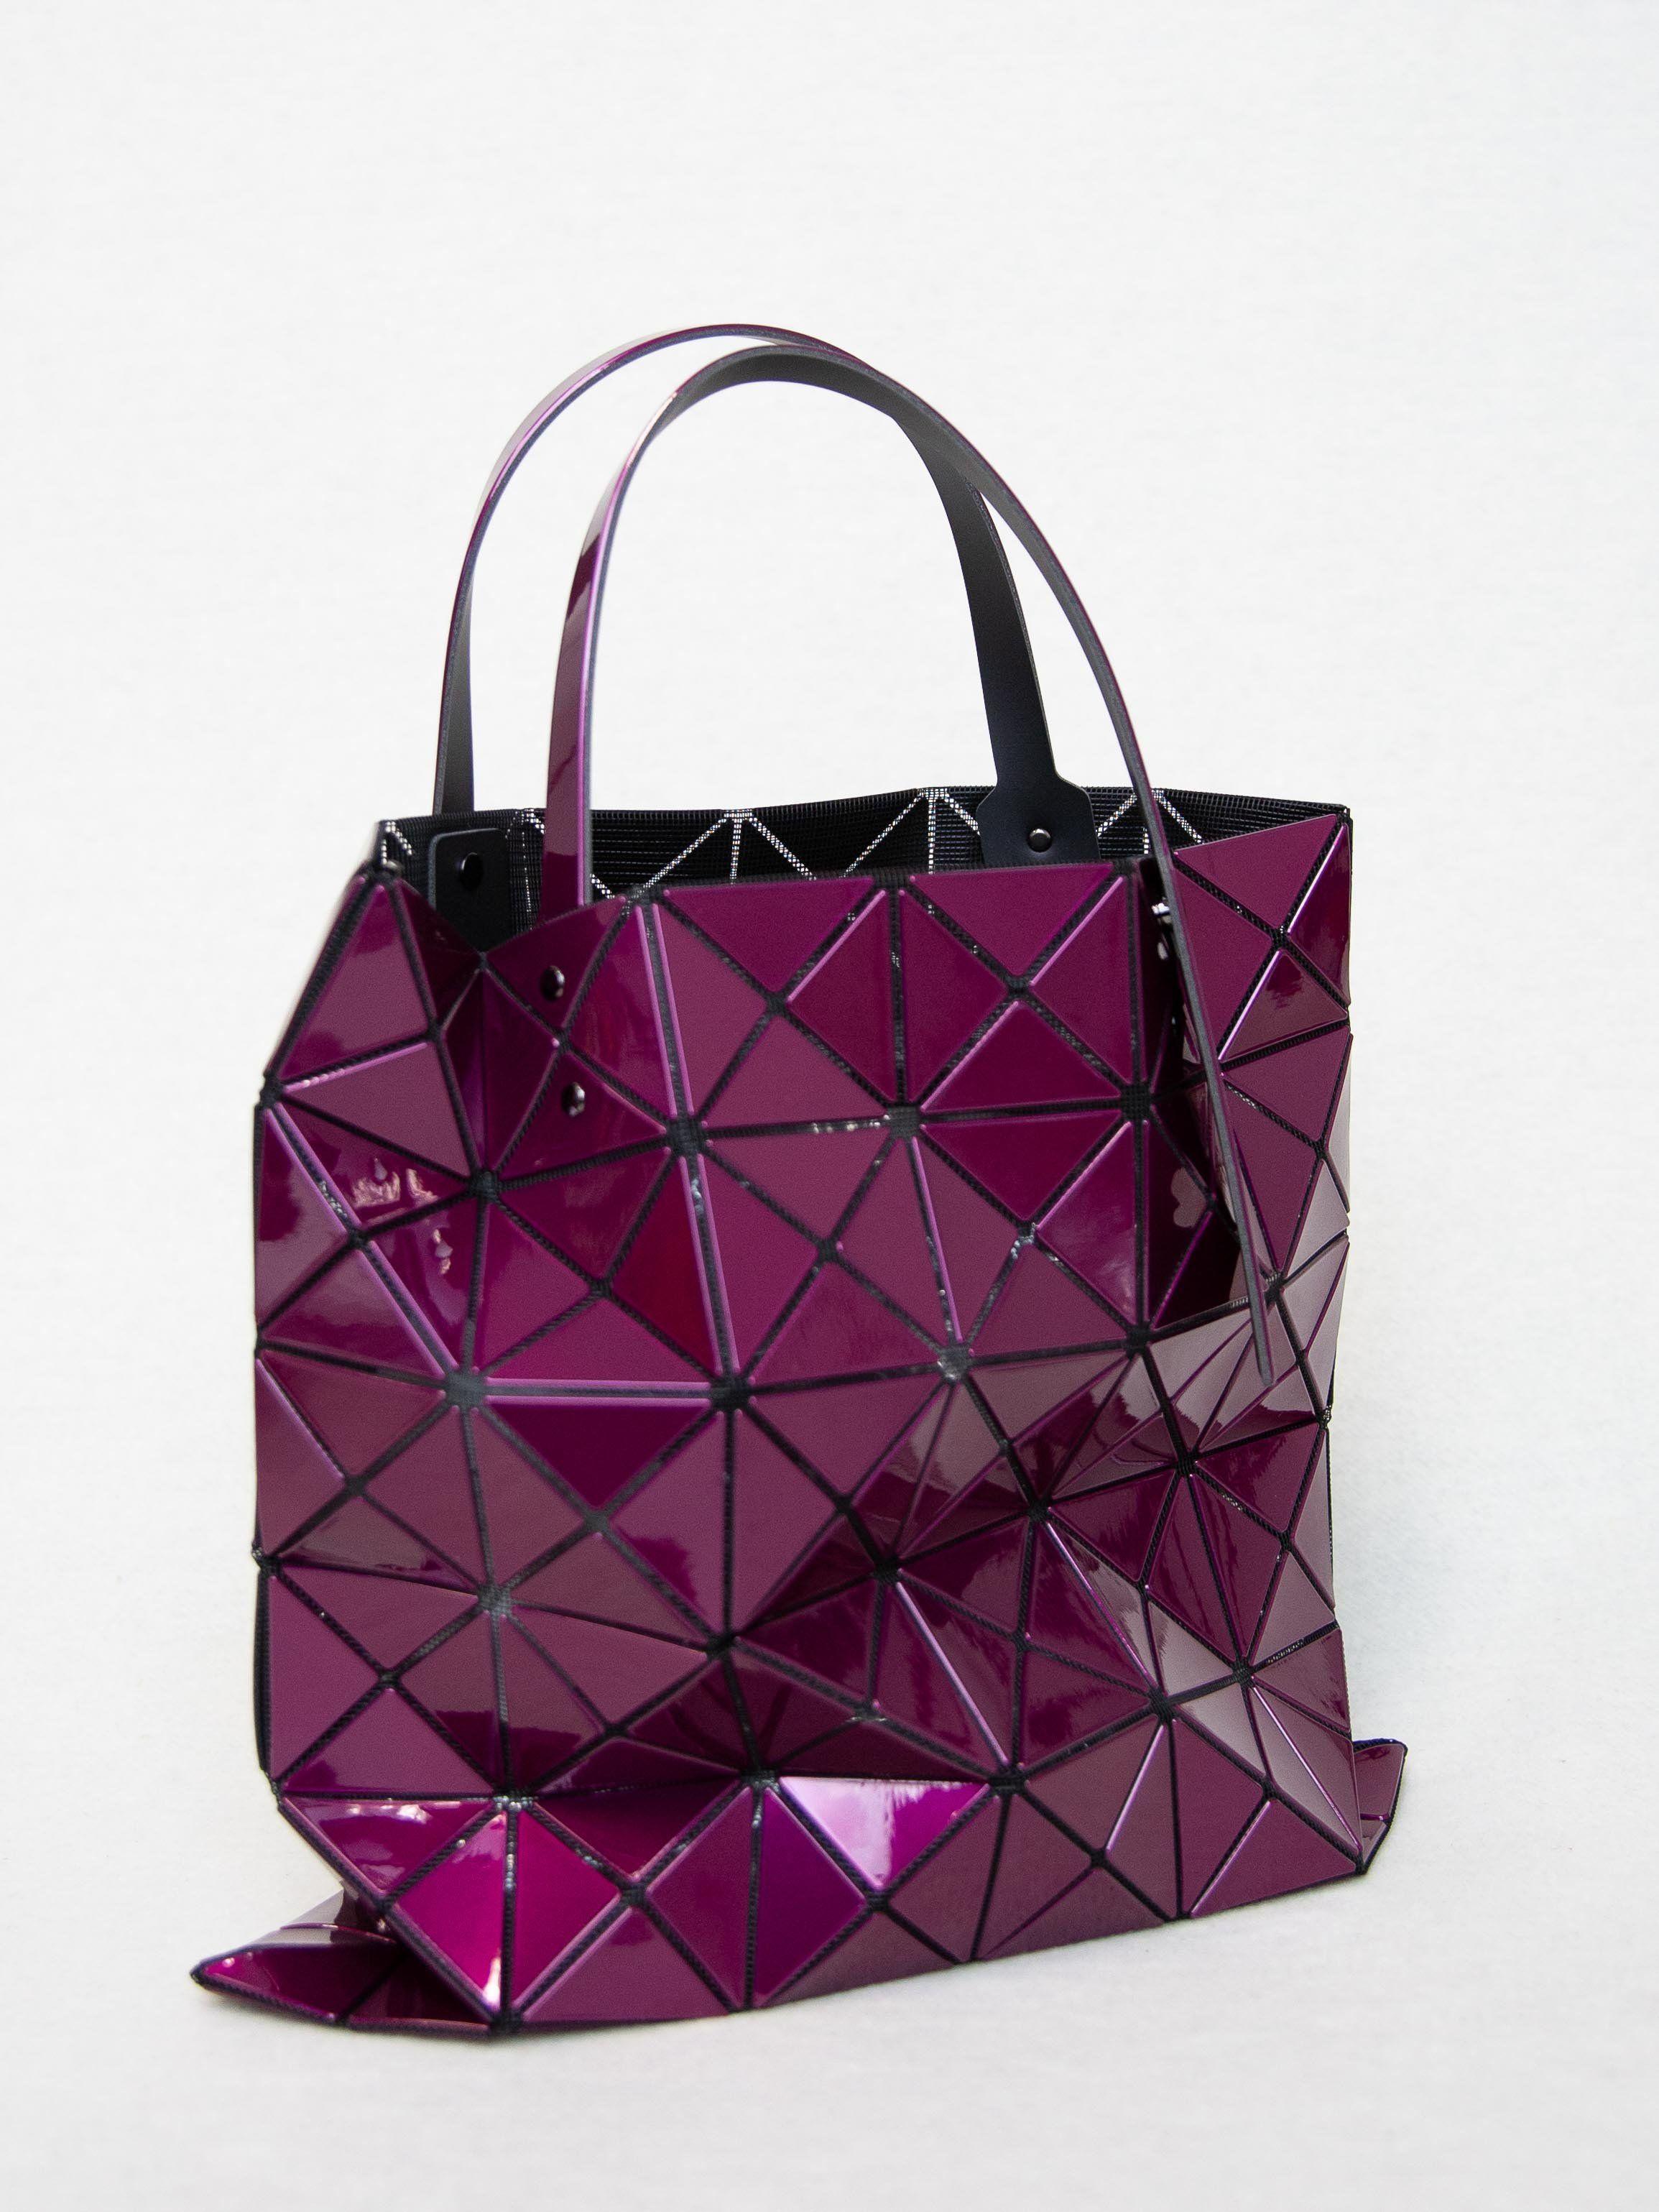 5740008d516a BAO BAO ISSEY MIYAKE Lucent Metallic Tote Bag - Bordeaux